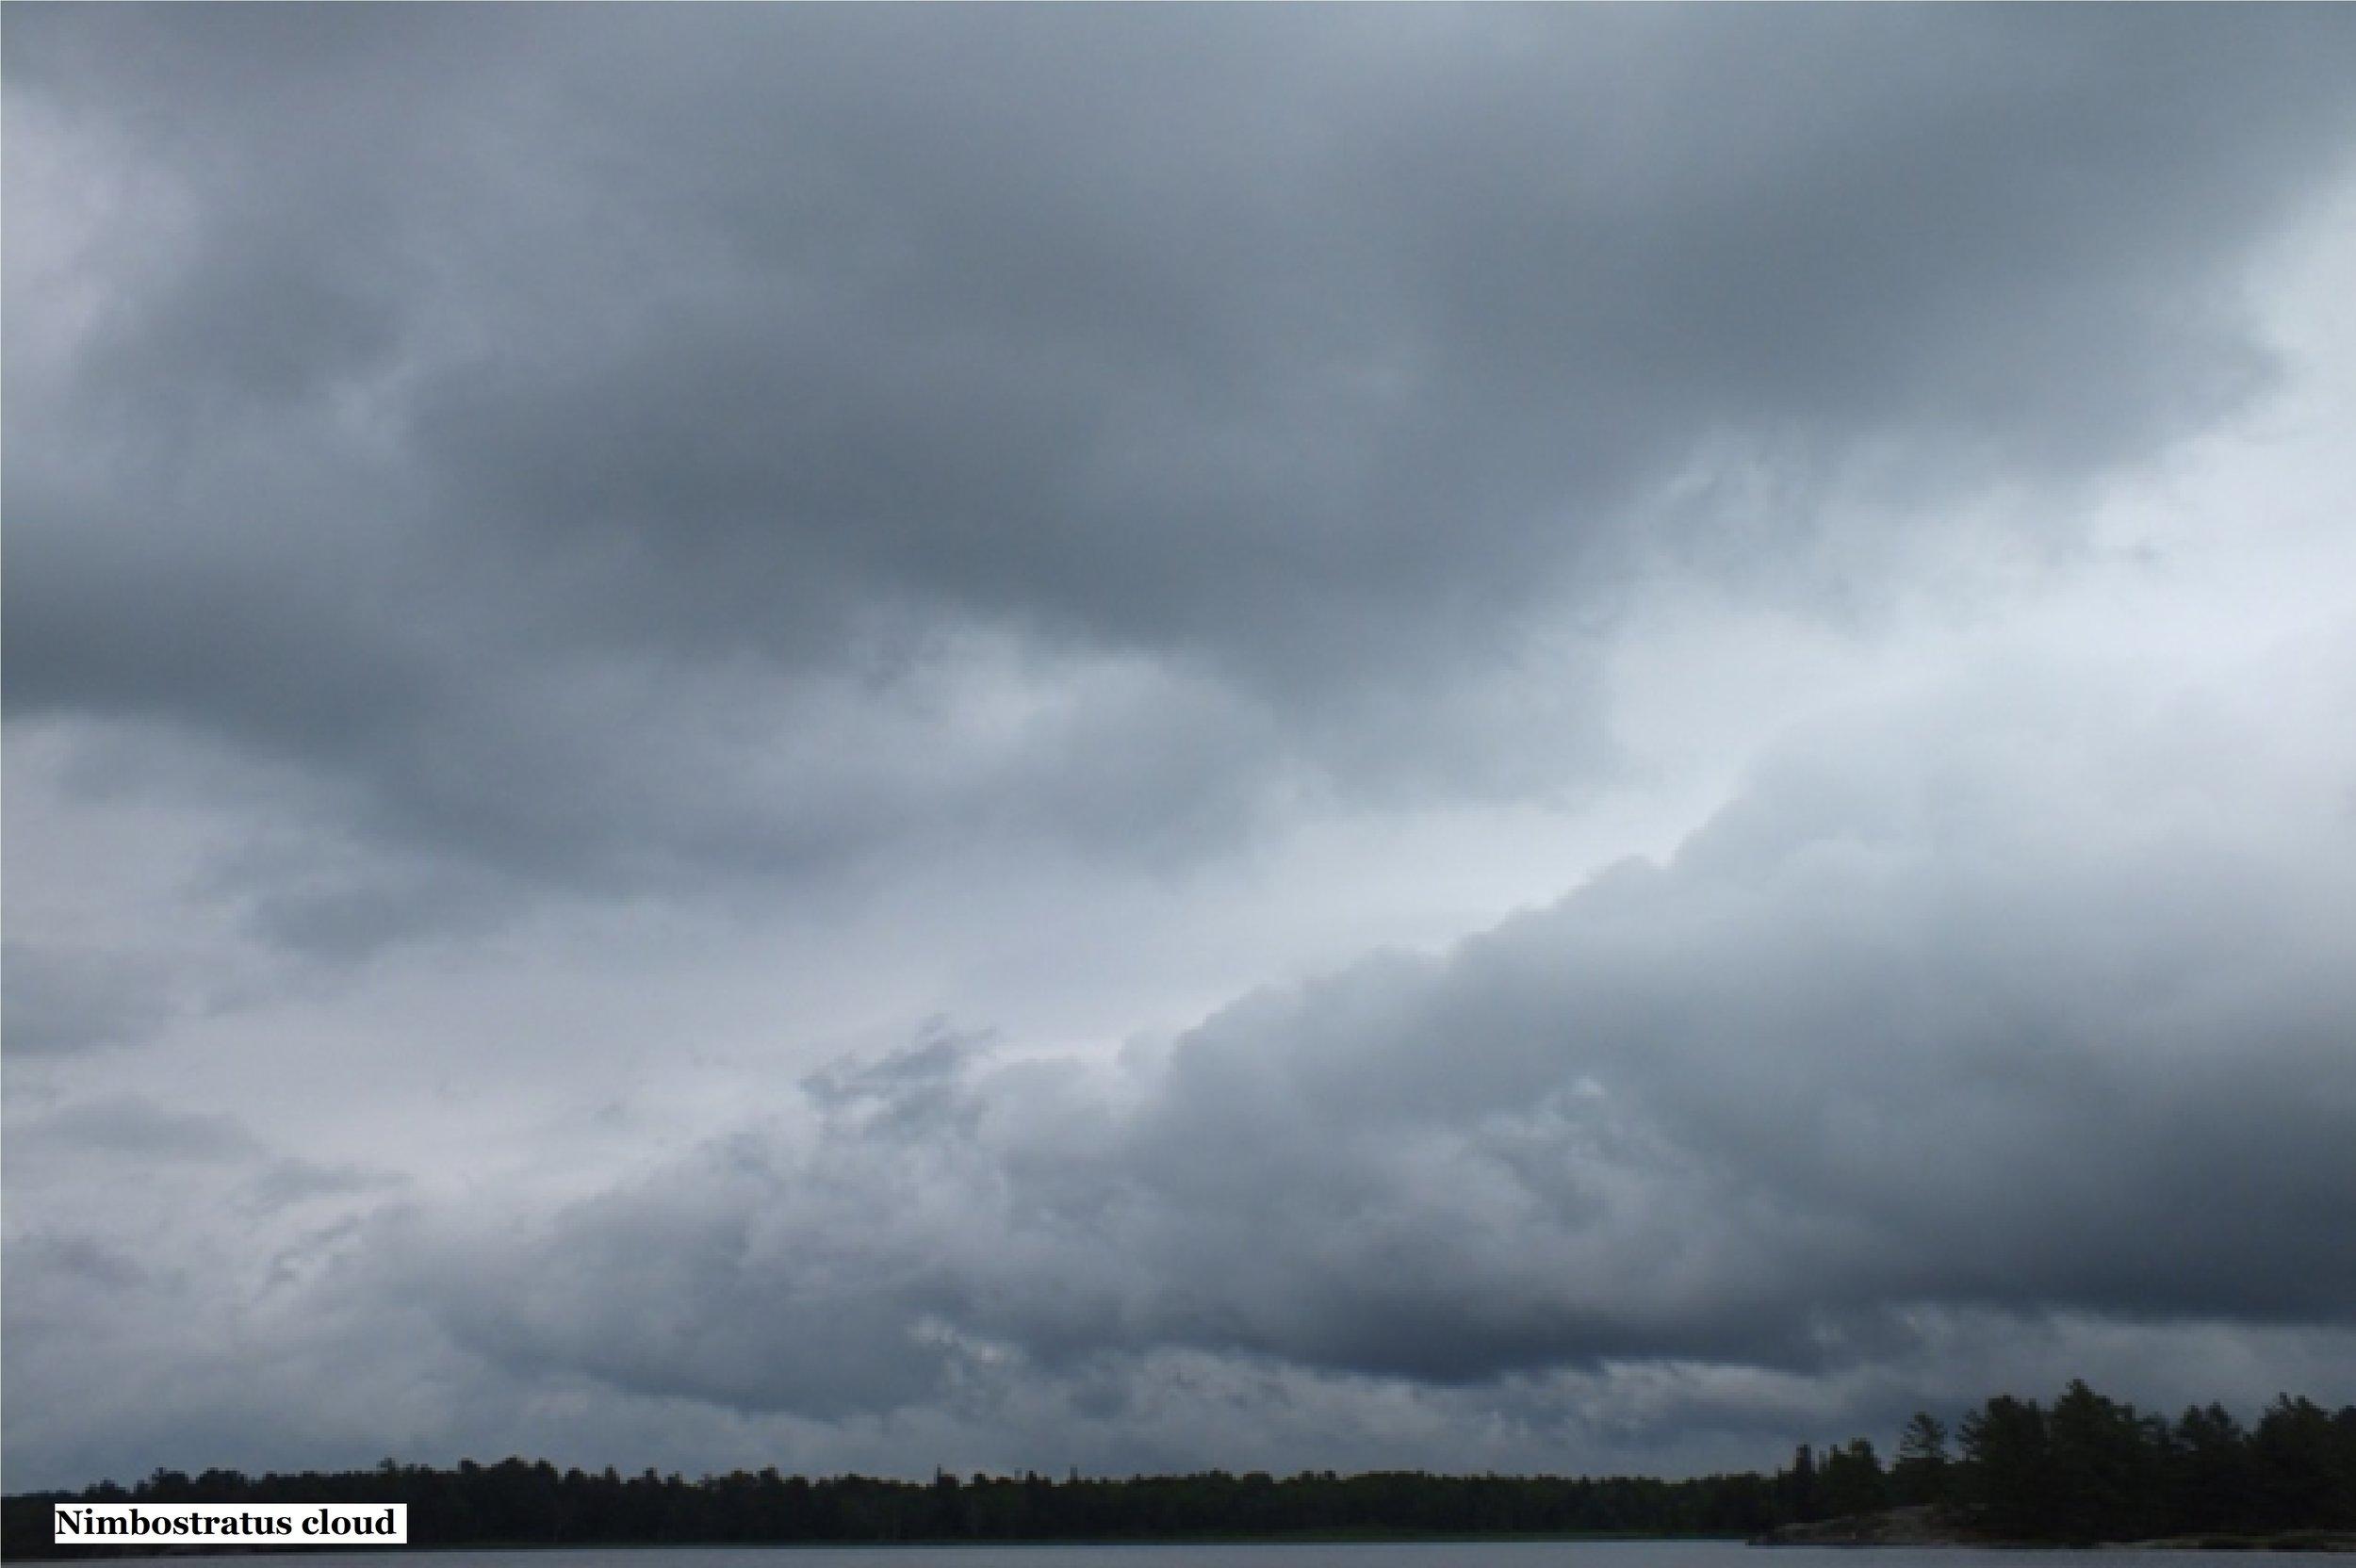 7 Nimbostratus cloud.jpg